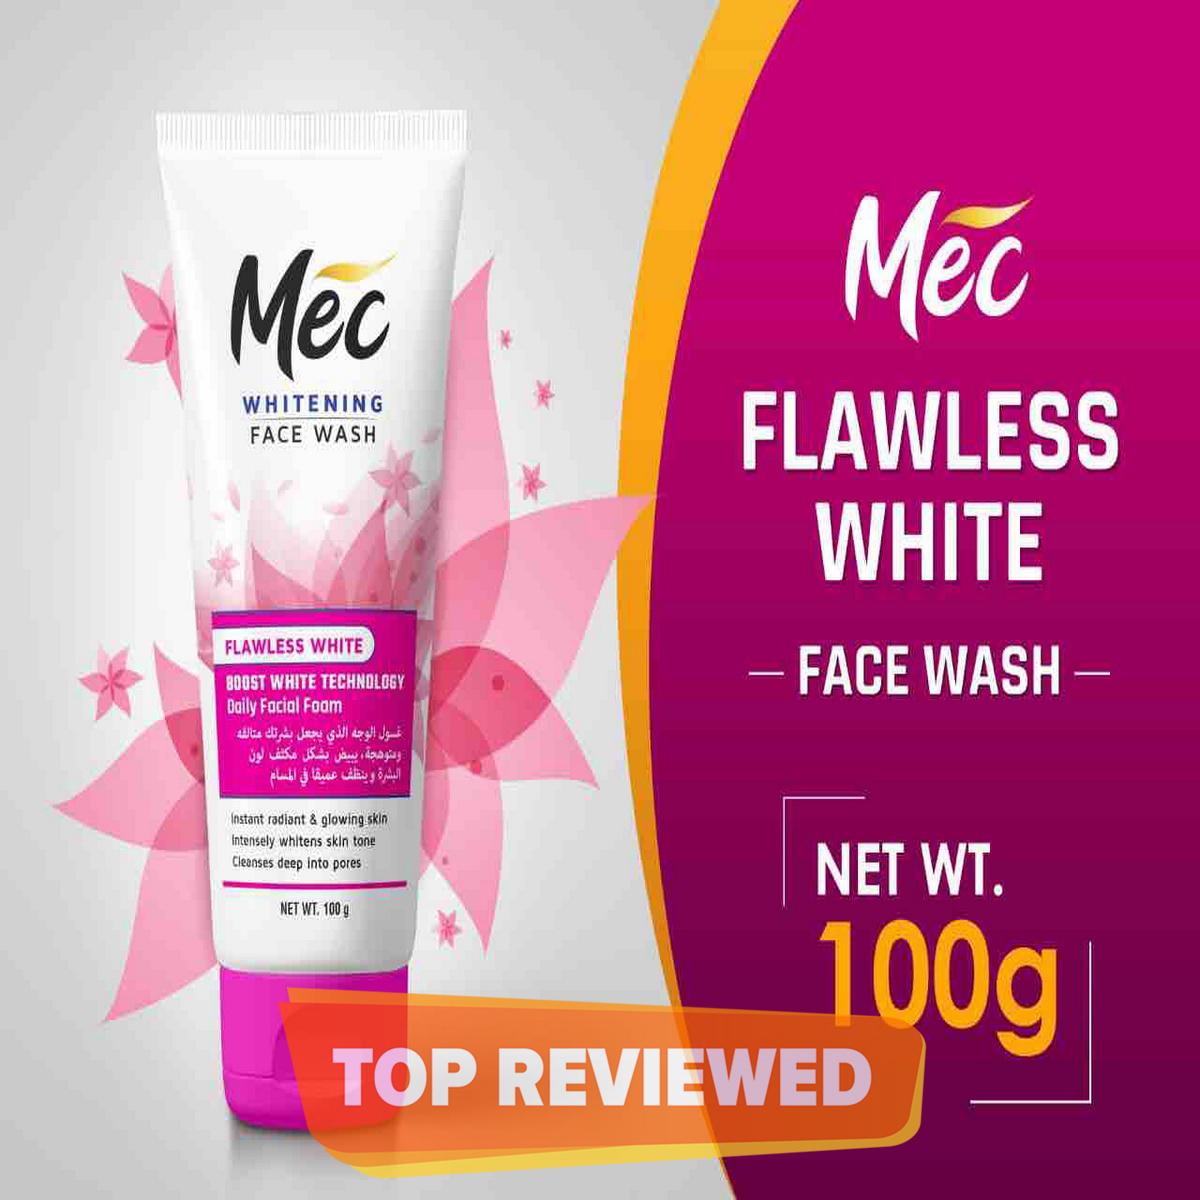 Mec Whitening Flawless White Face Wash